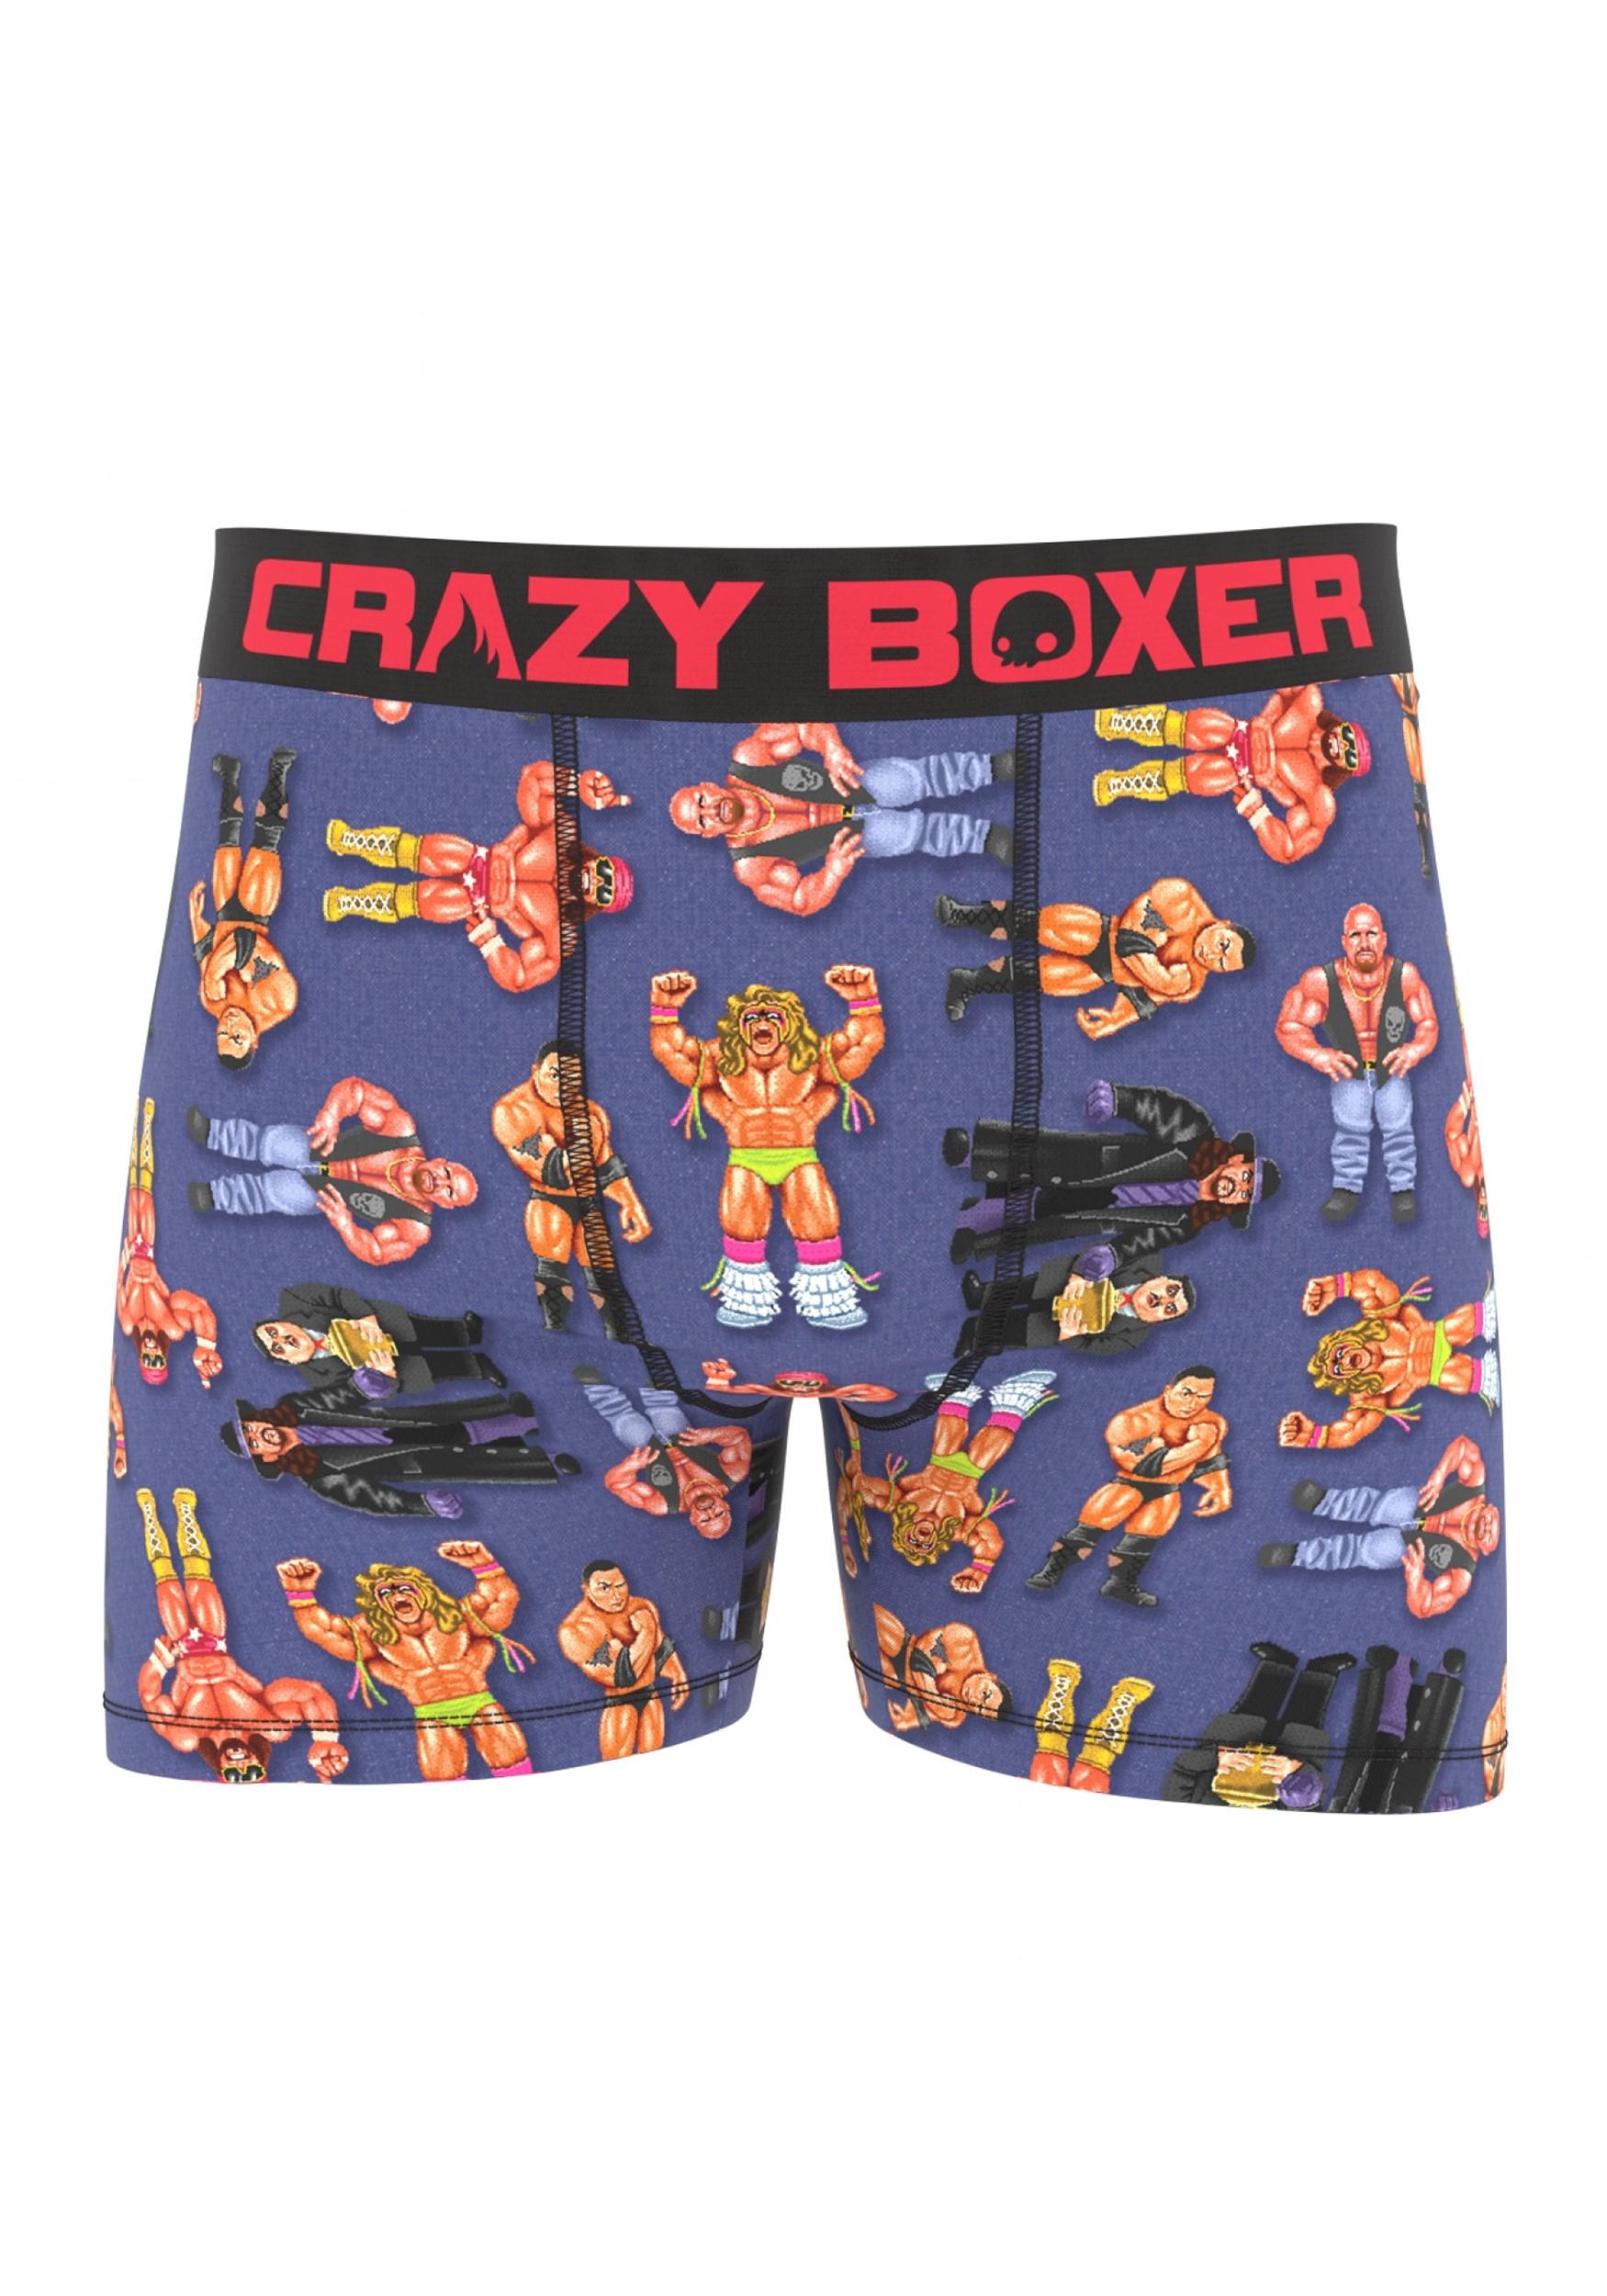 Crazy Boxer WWE Wrestling Battle Boxer Briefs